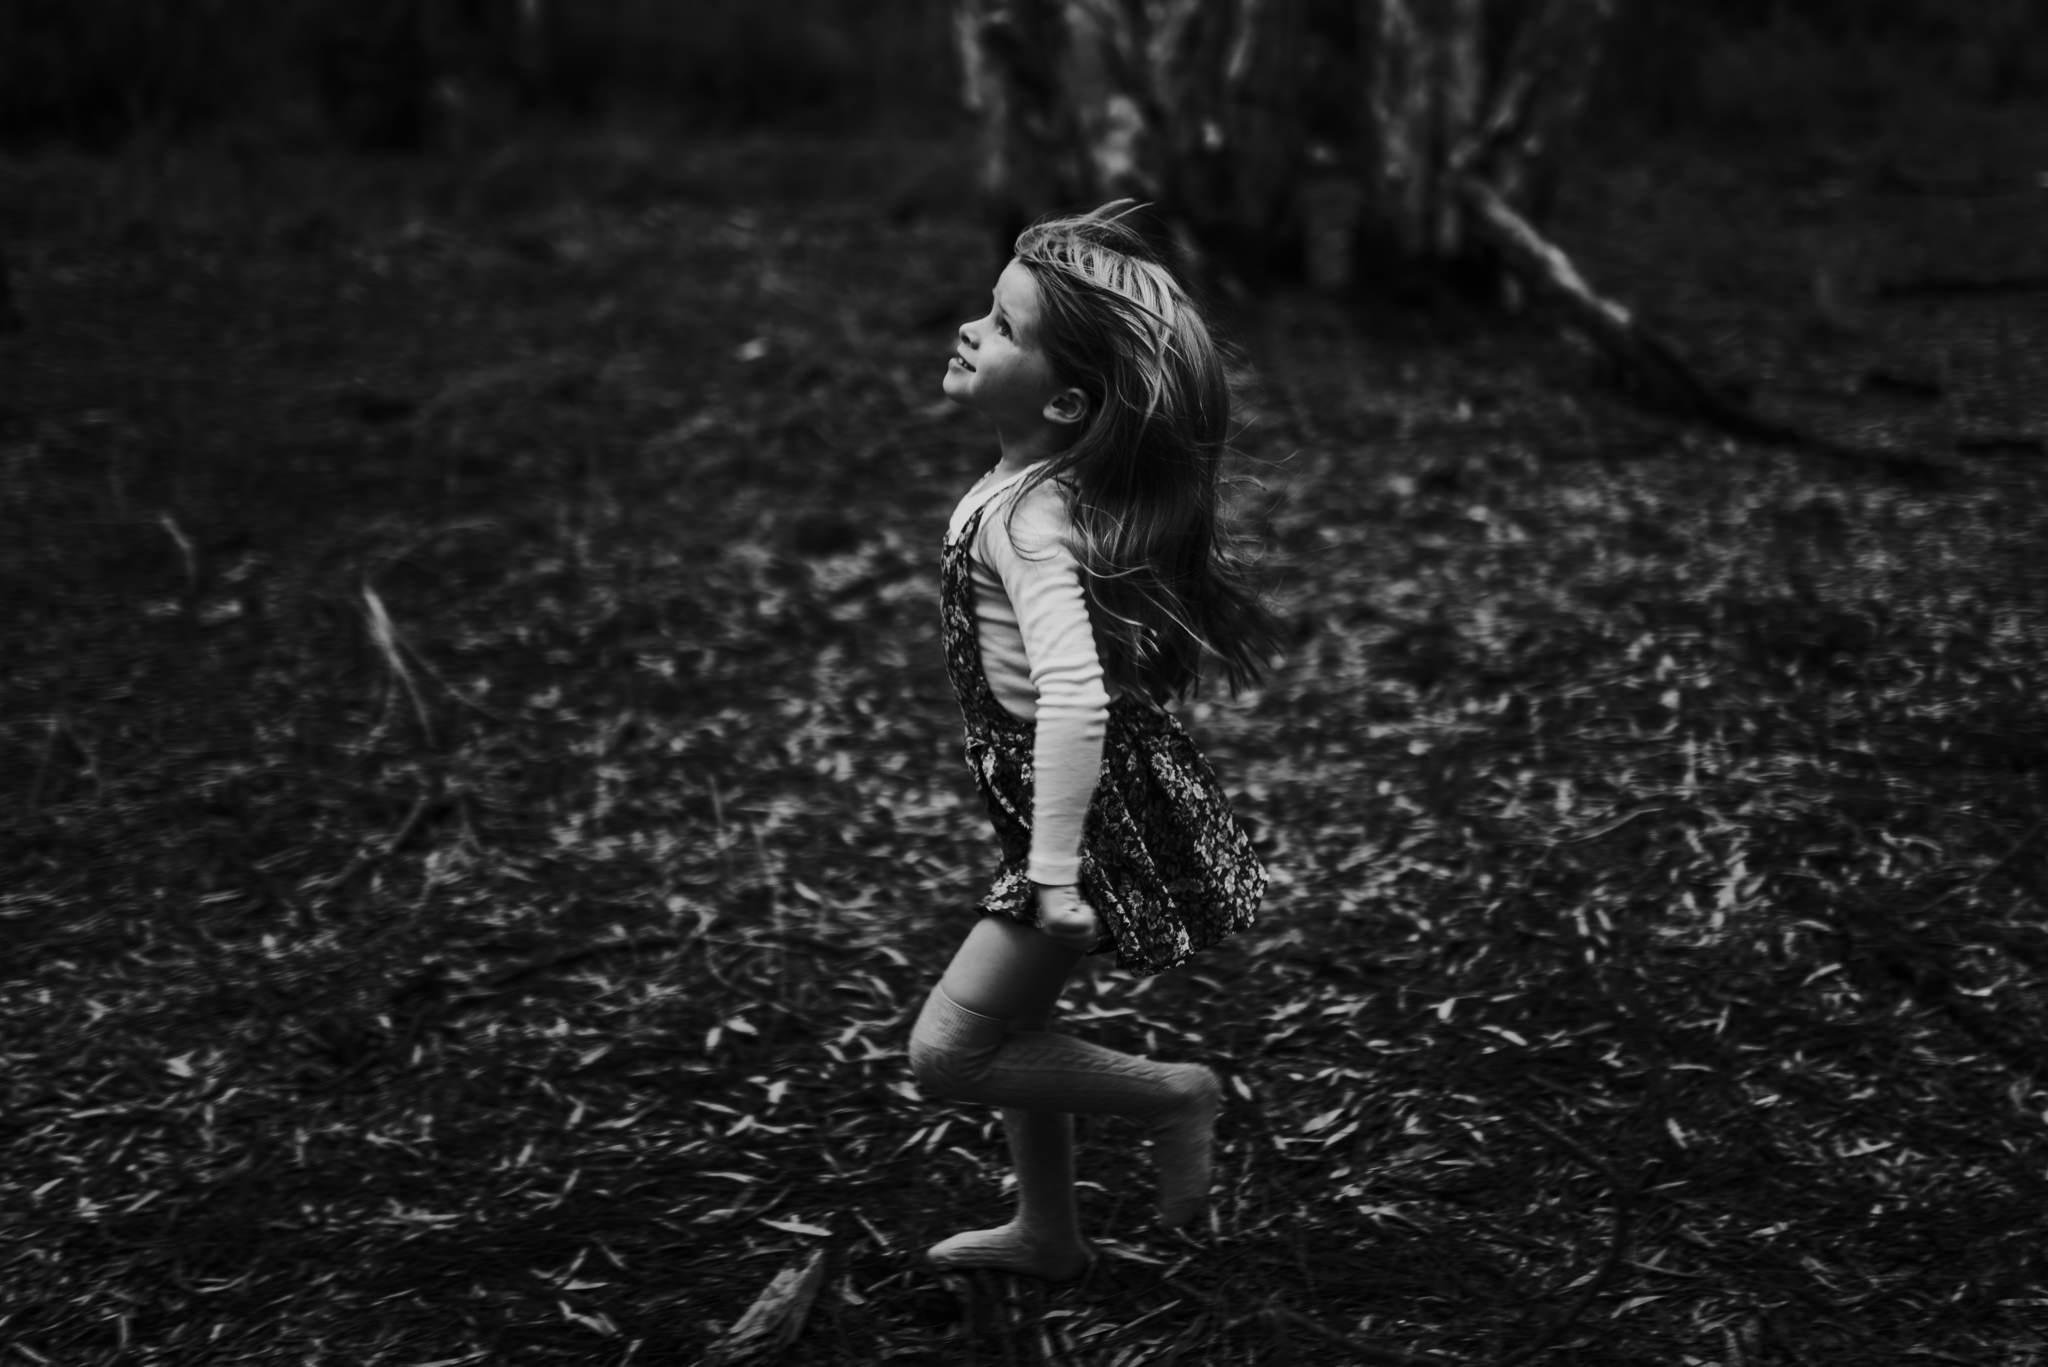 twyla jones photography - treasure coast florida - childrens adventure clothing commercial shoot--11.jpg